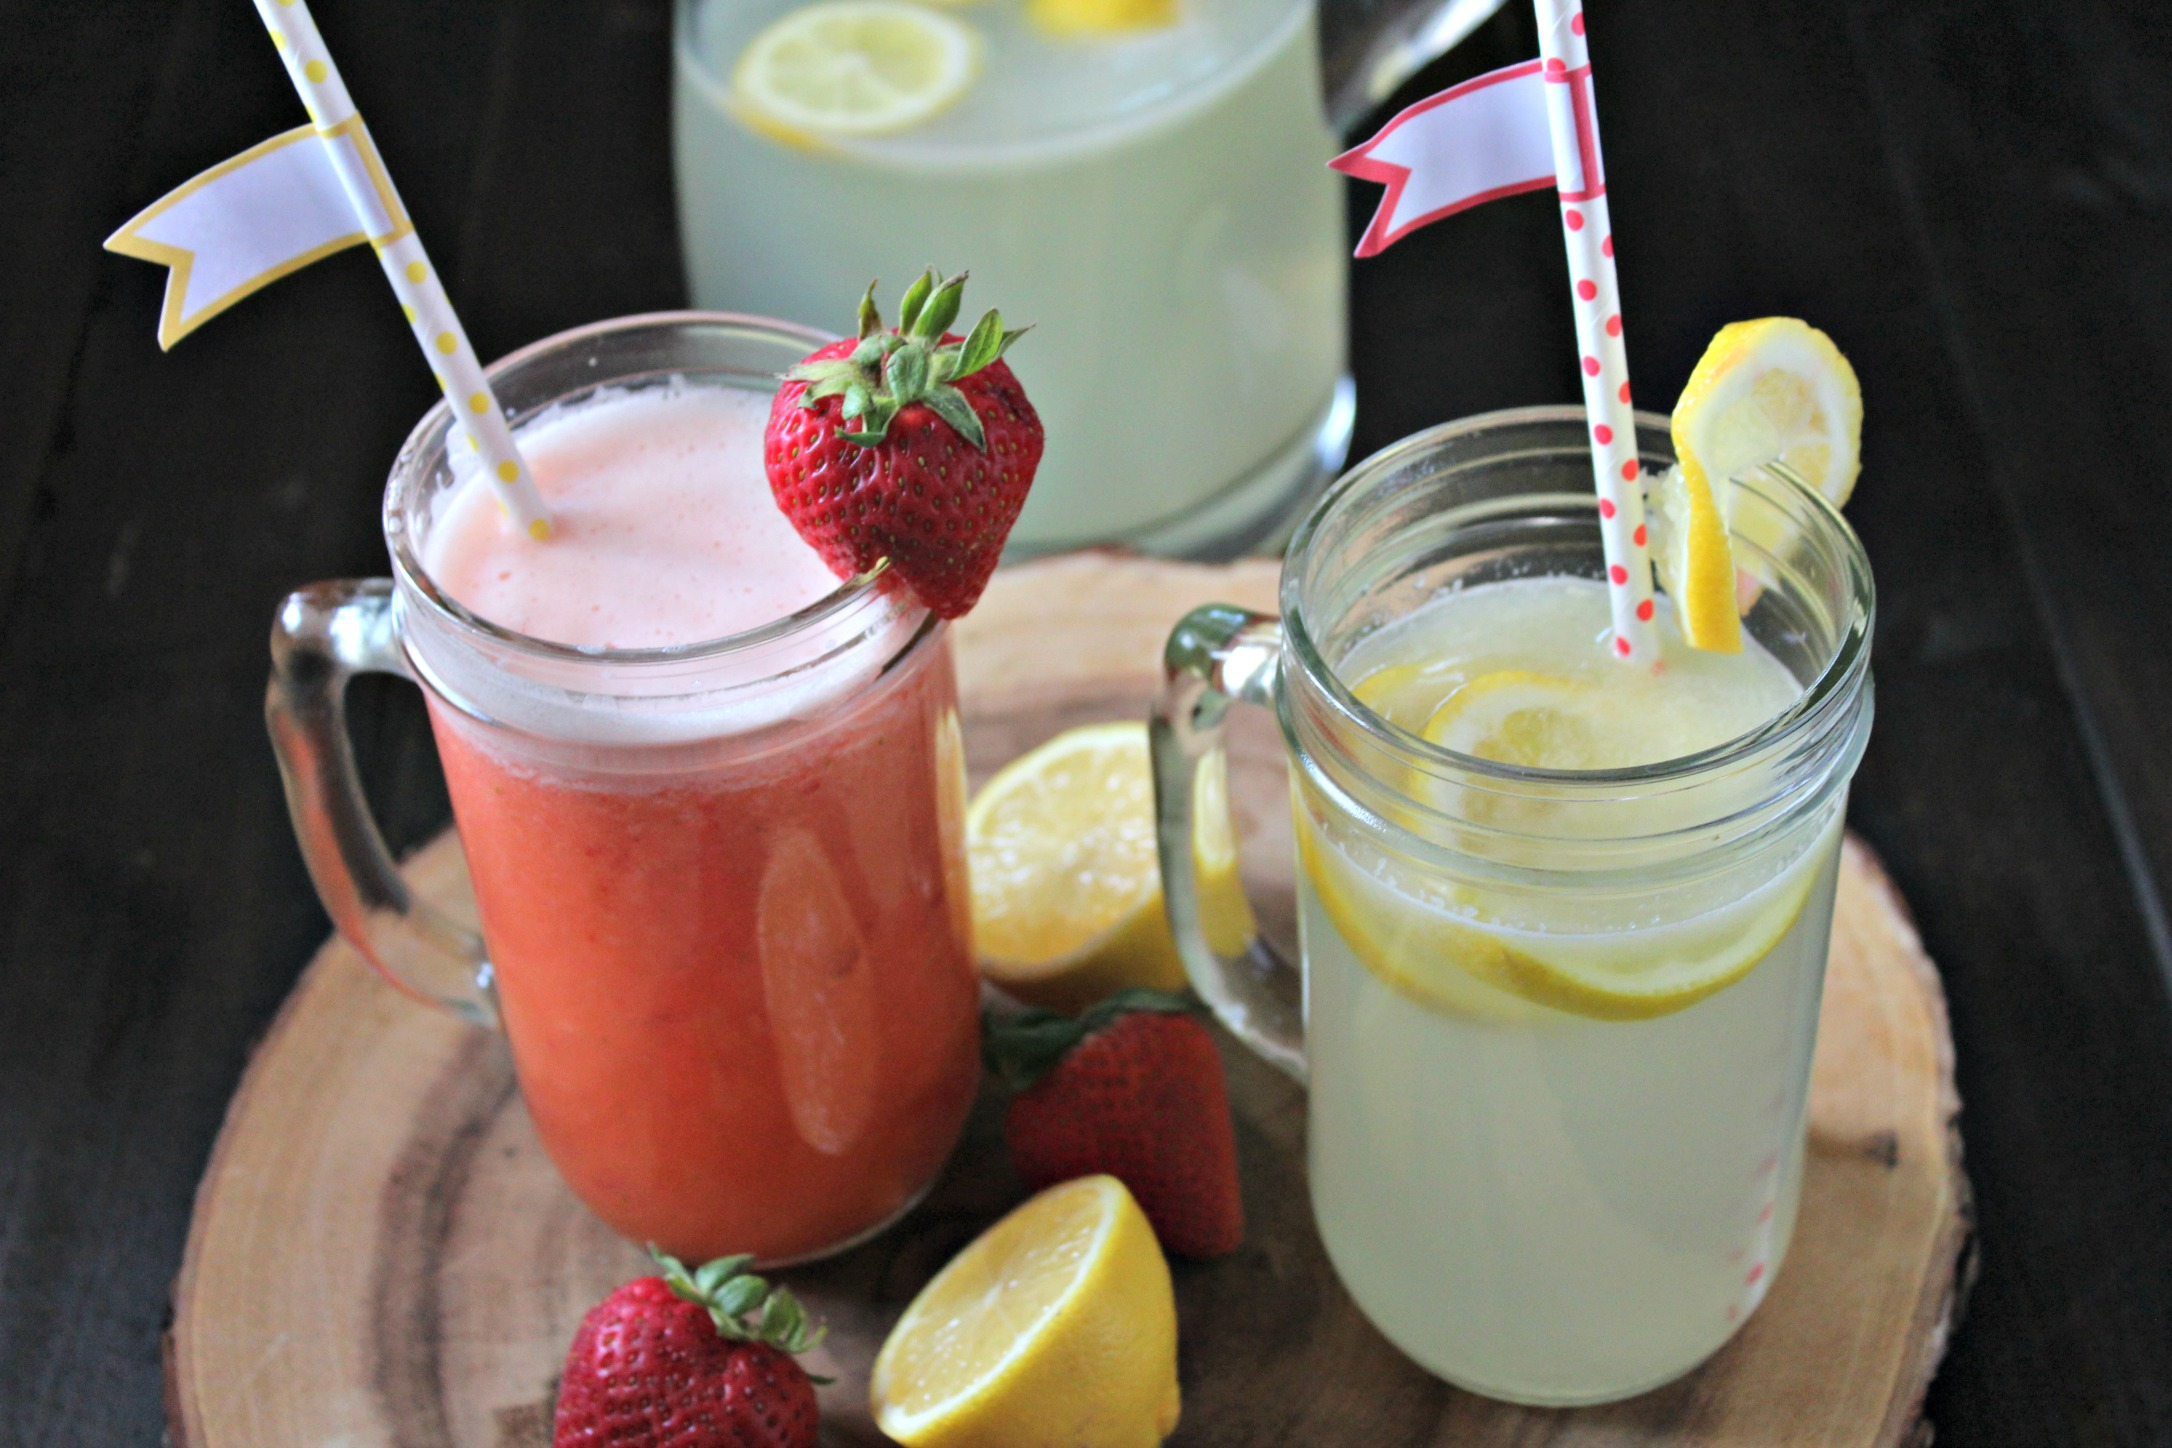 Diet Strawberry Lemonade 3